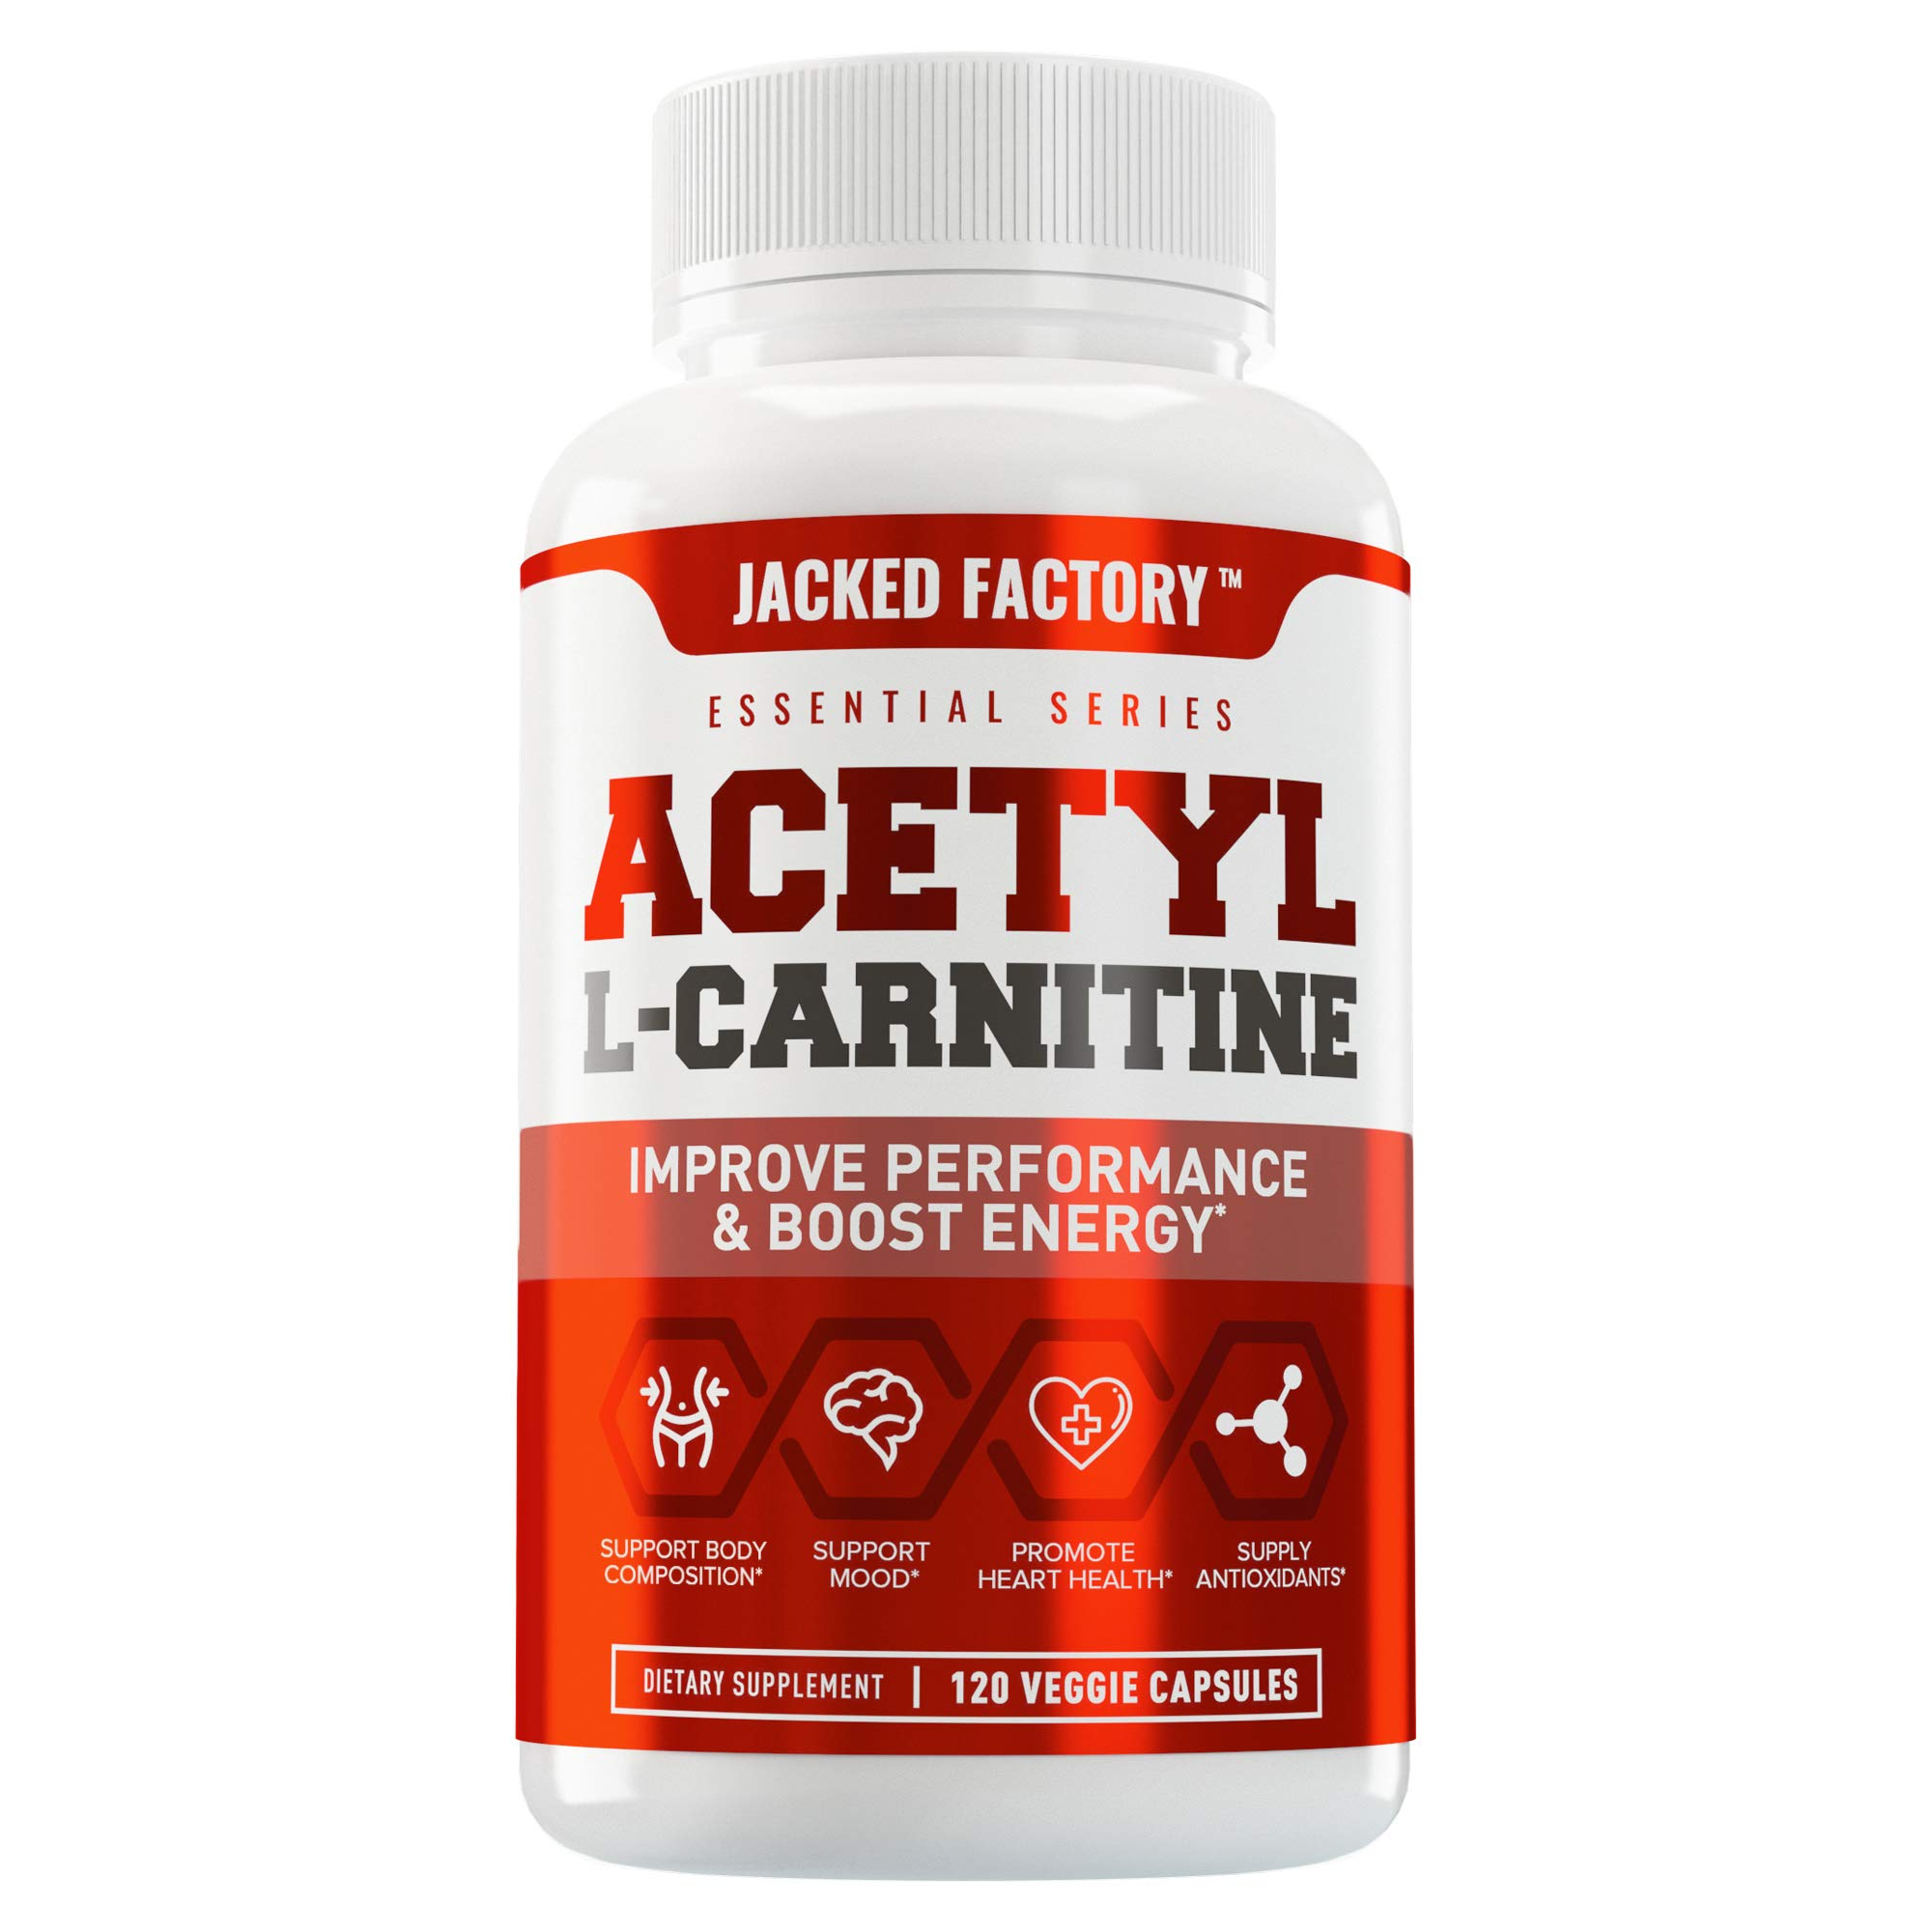 Acetyl L Carnitine Supplement - Premium ALCAR L-Carnitine Supplement for Energy, Body Recomposition, Memory & Focus - Zero Fillers - 120 Non GMO Veggie Pills